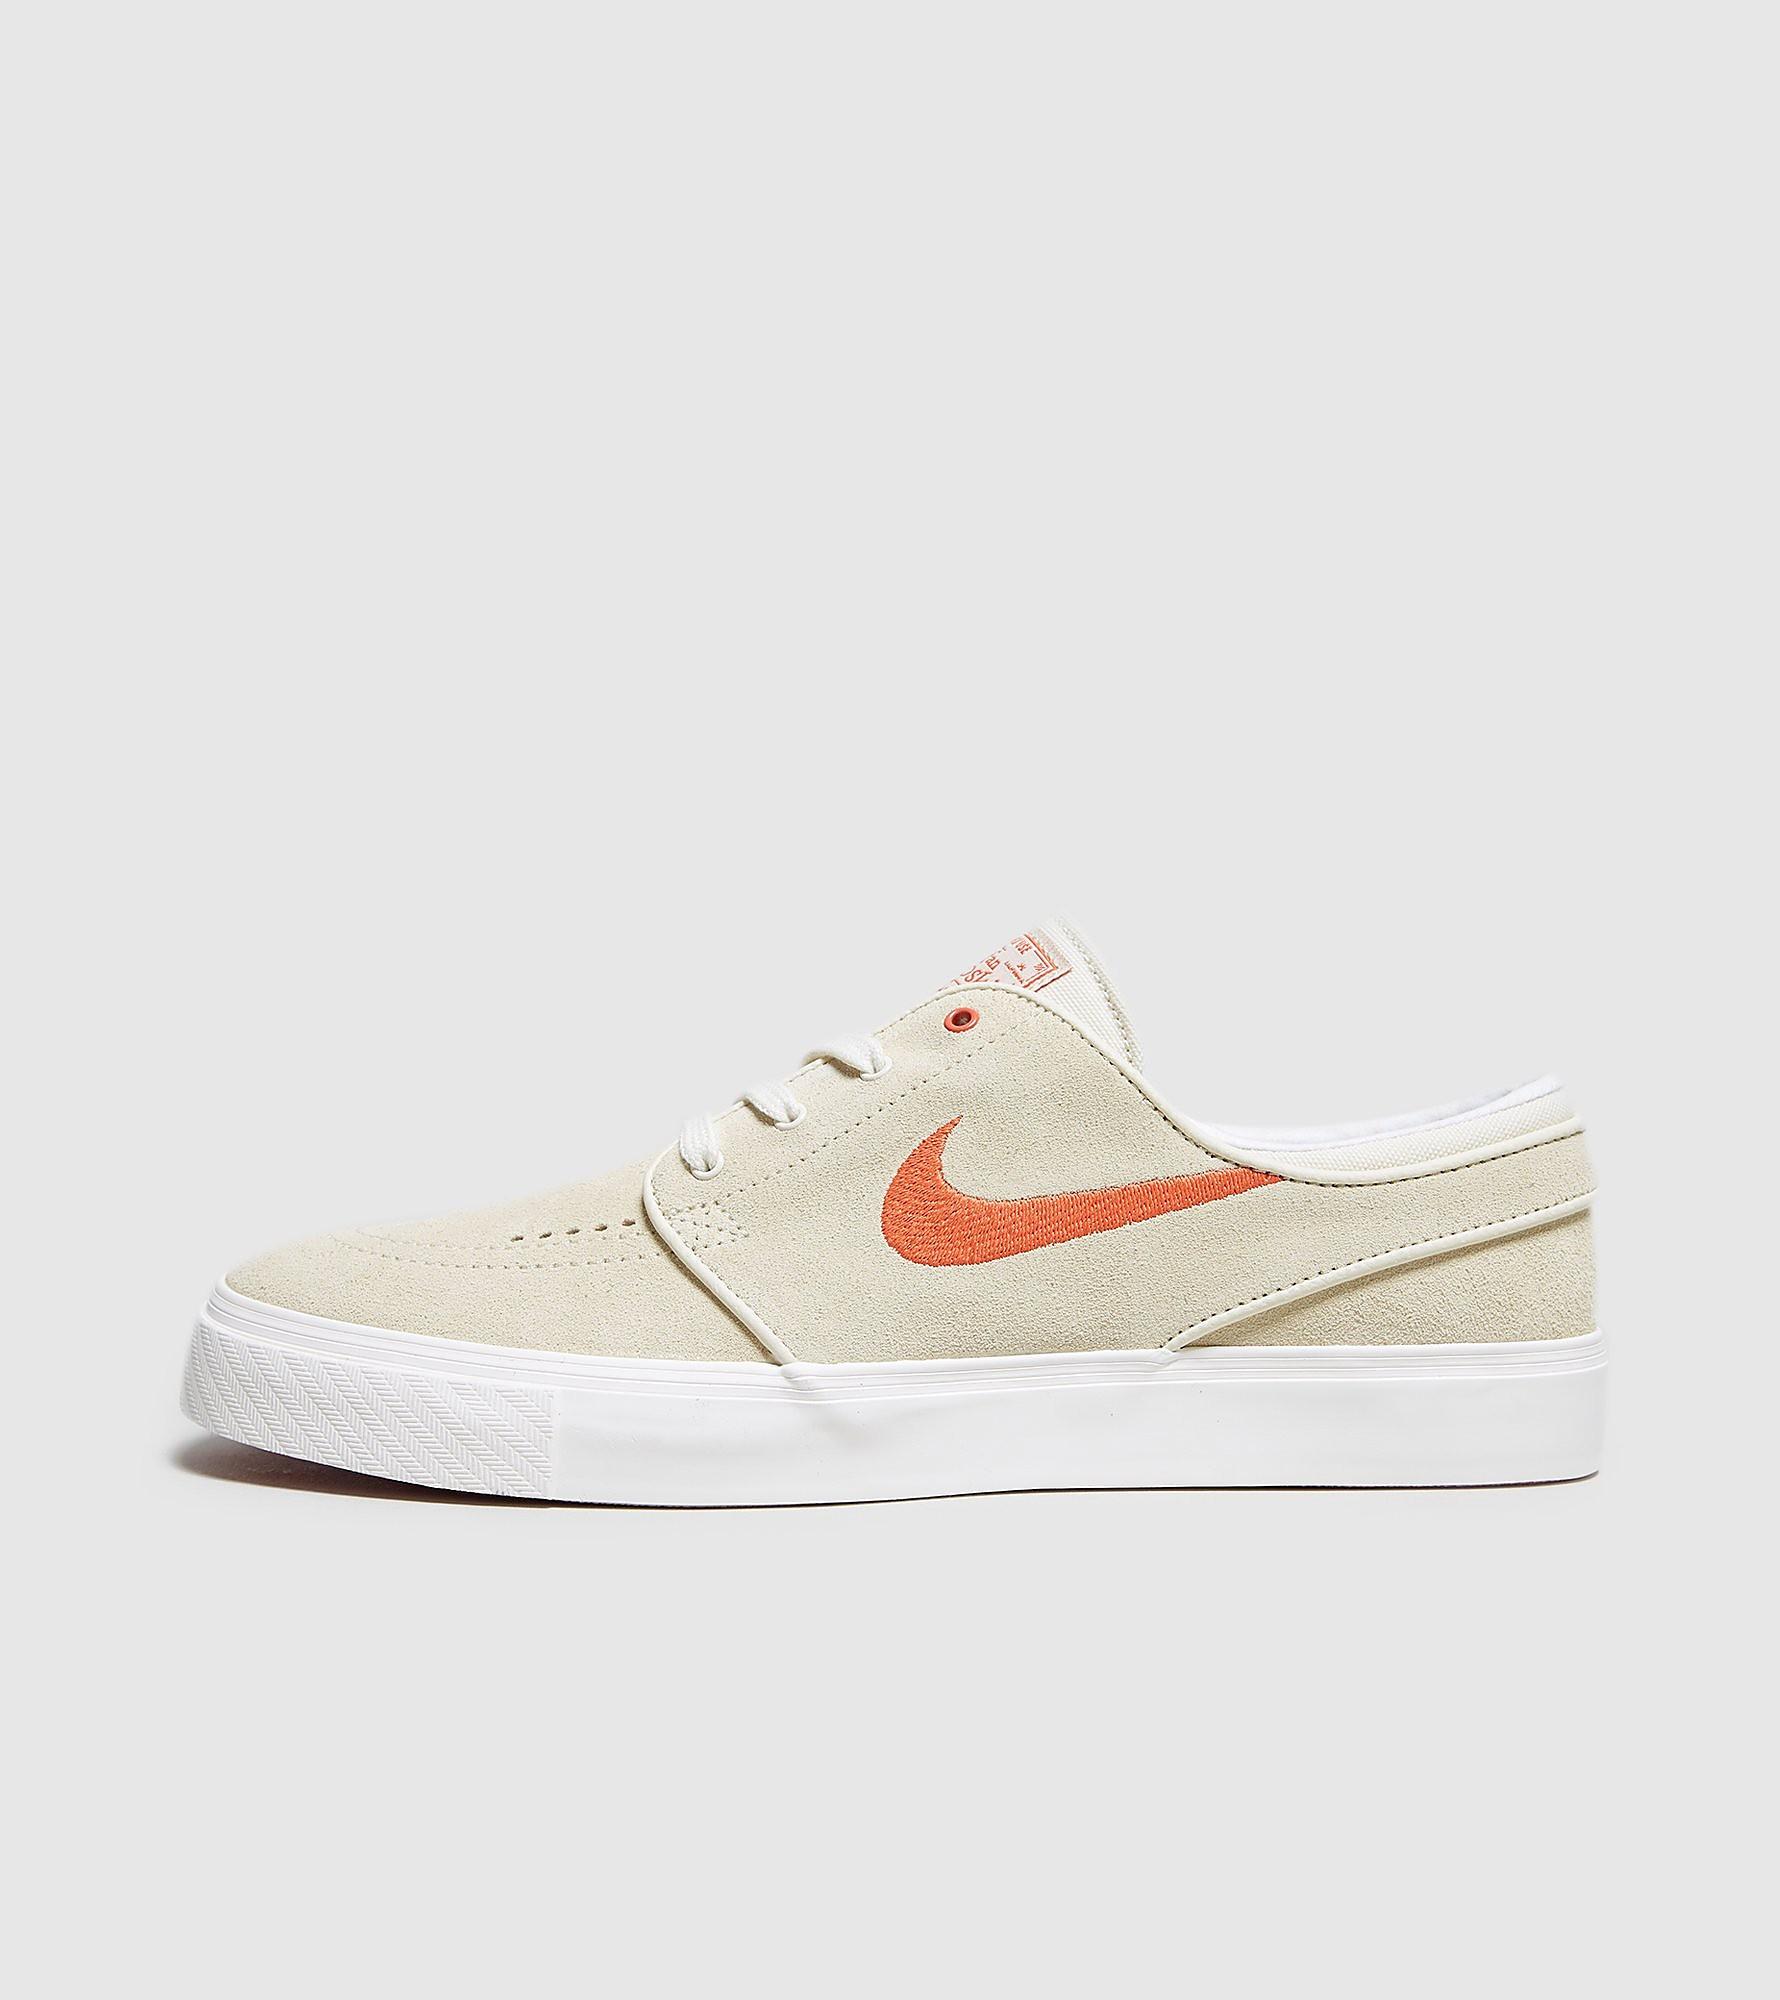 Nike SB Janoski Zoom